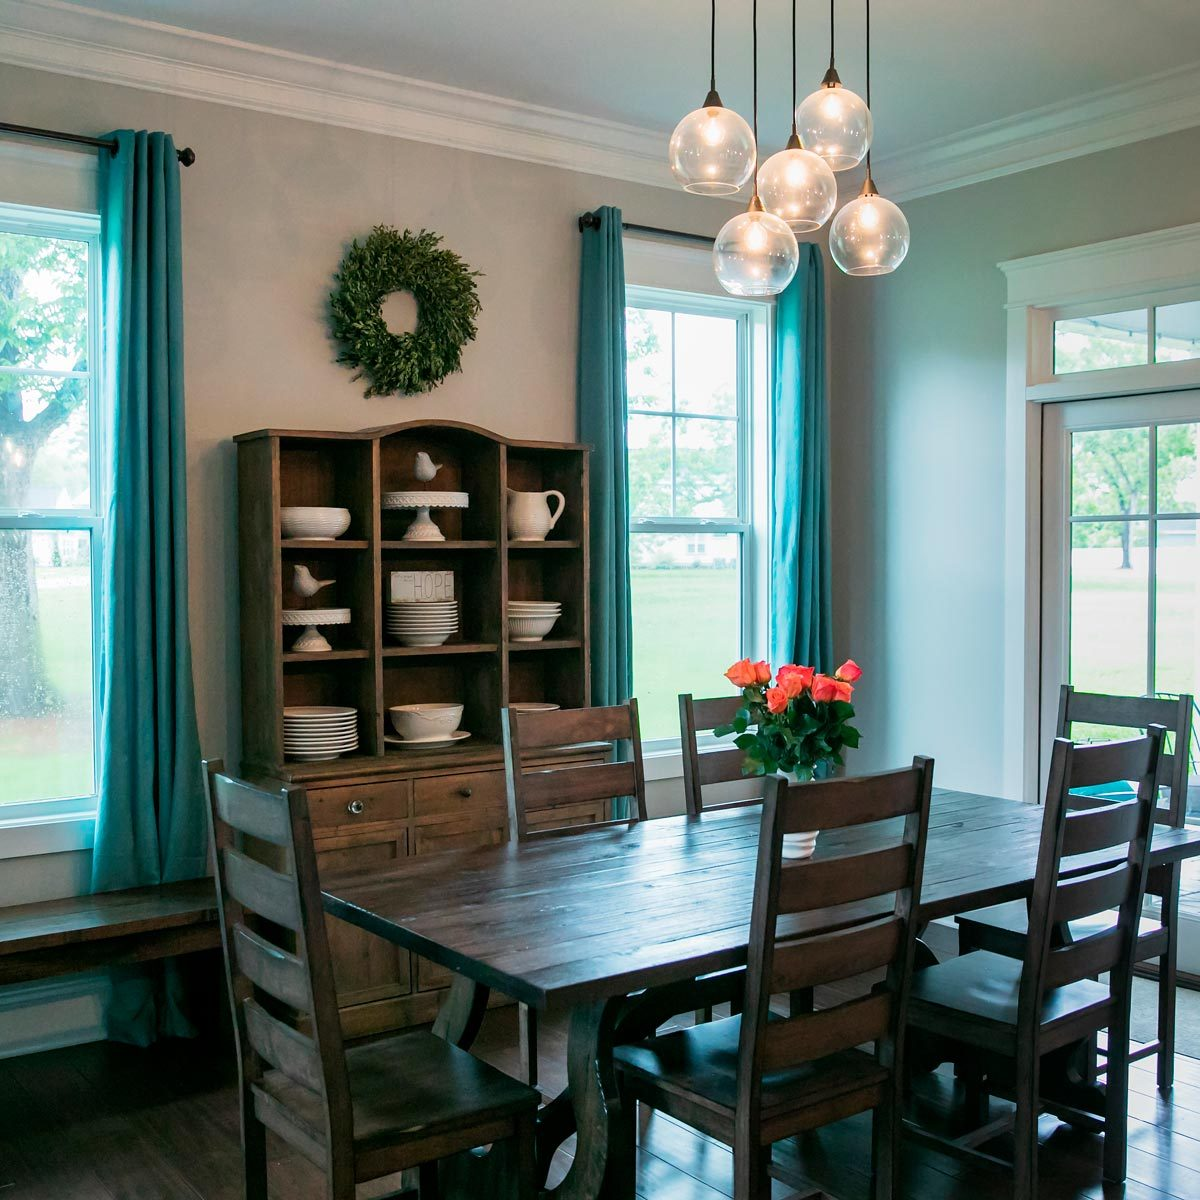 Stylish Dining Room Curtain Ideas | Family Handyman on Dining Room Curtain Ideas  id=85396